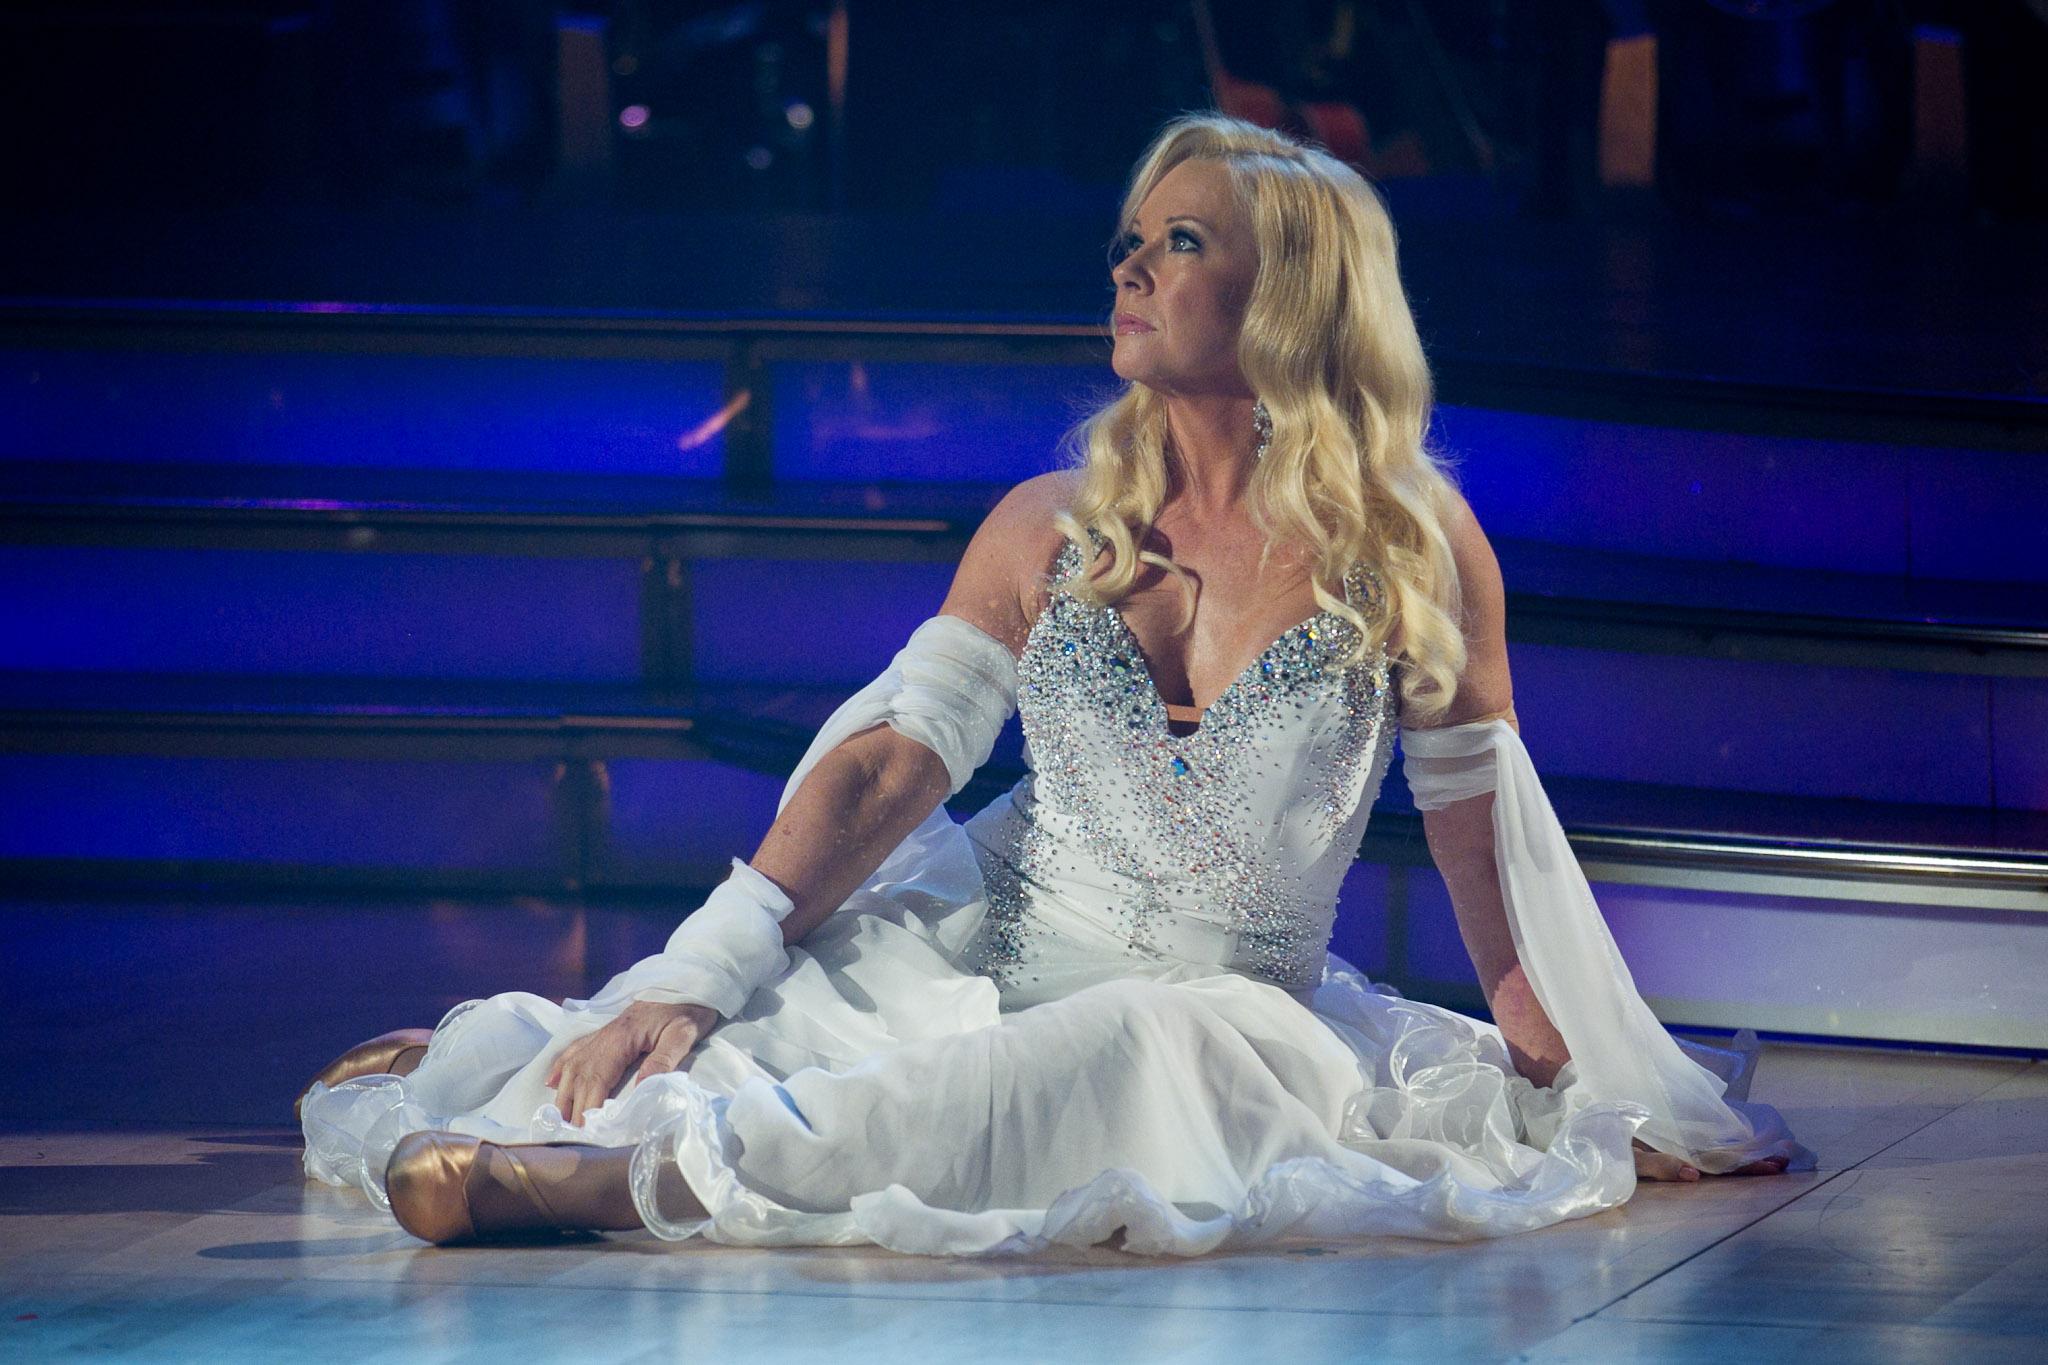 ballet news, Strictly, BBC, news, dance, Pamela Stephenson